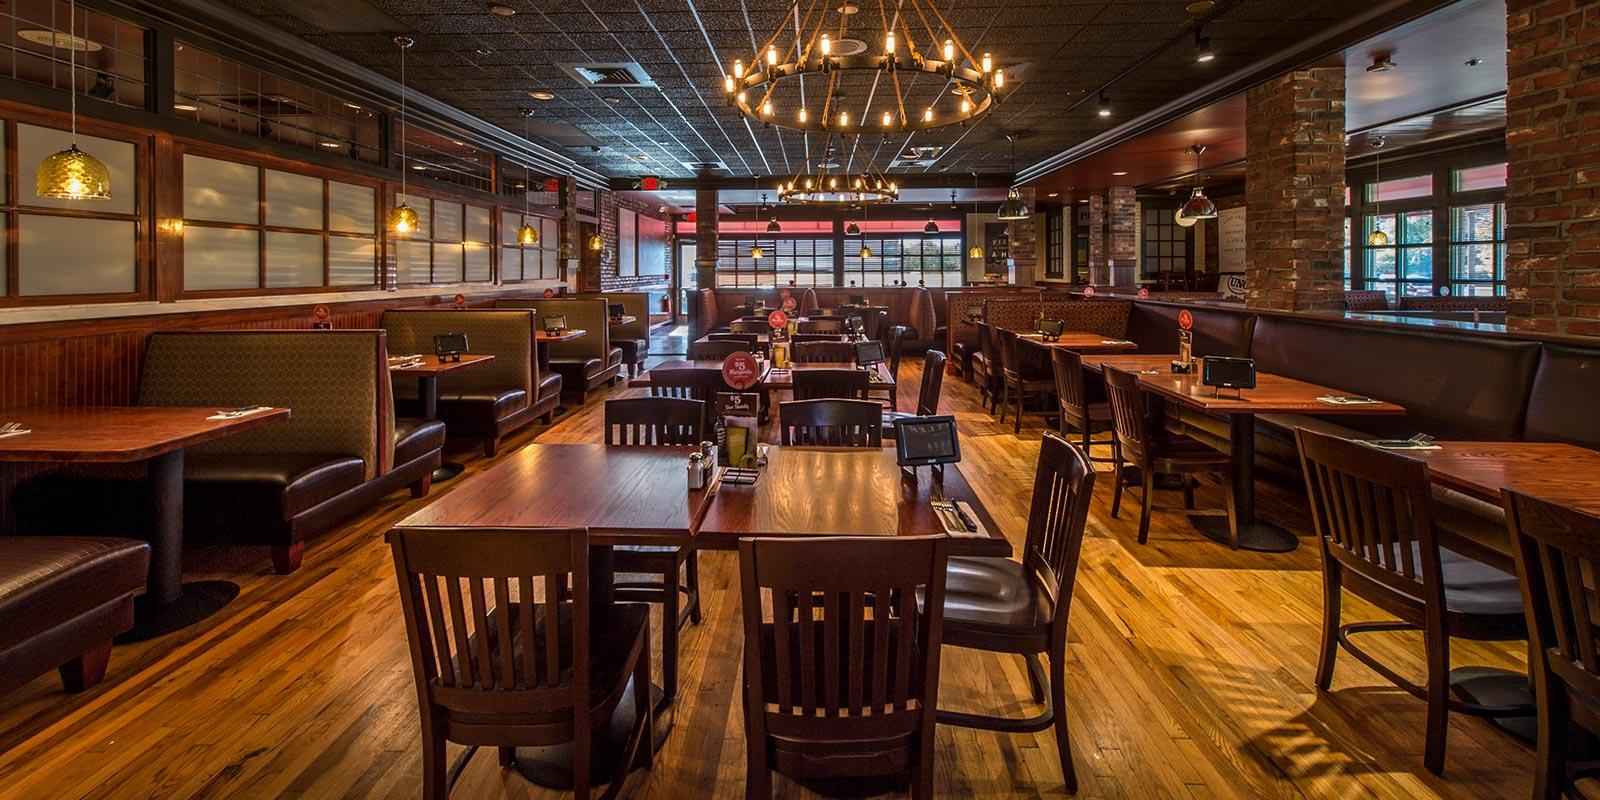 Uno Pizzeria & Grill - Dining Roomn